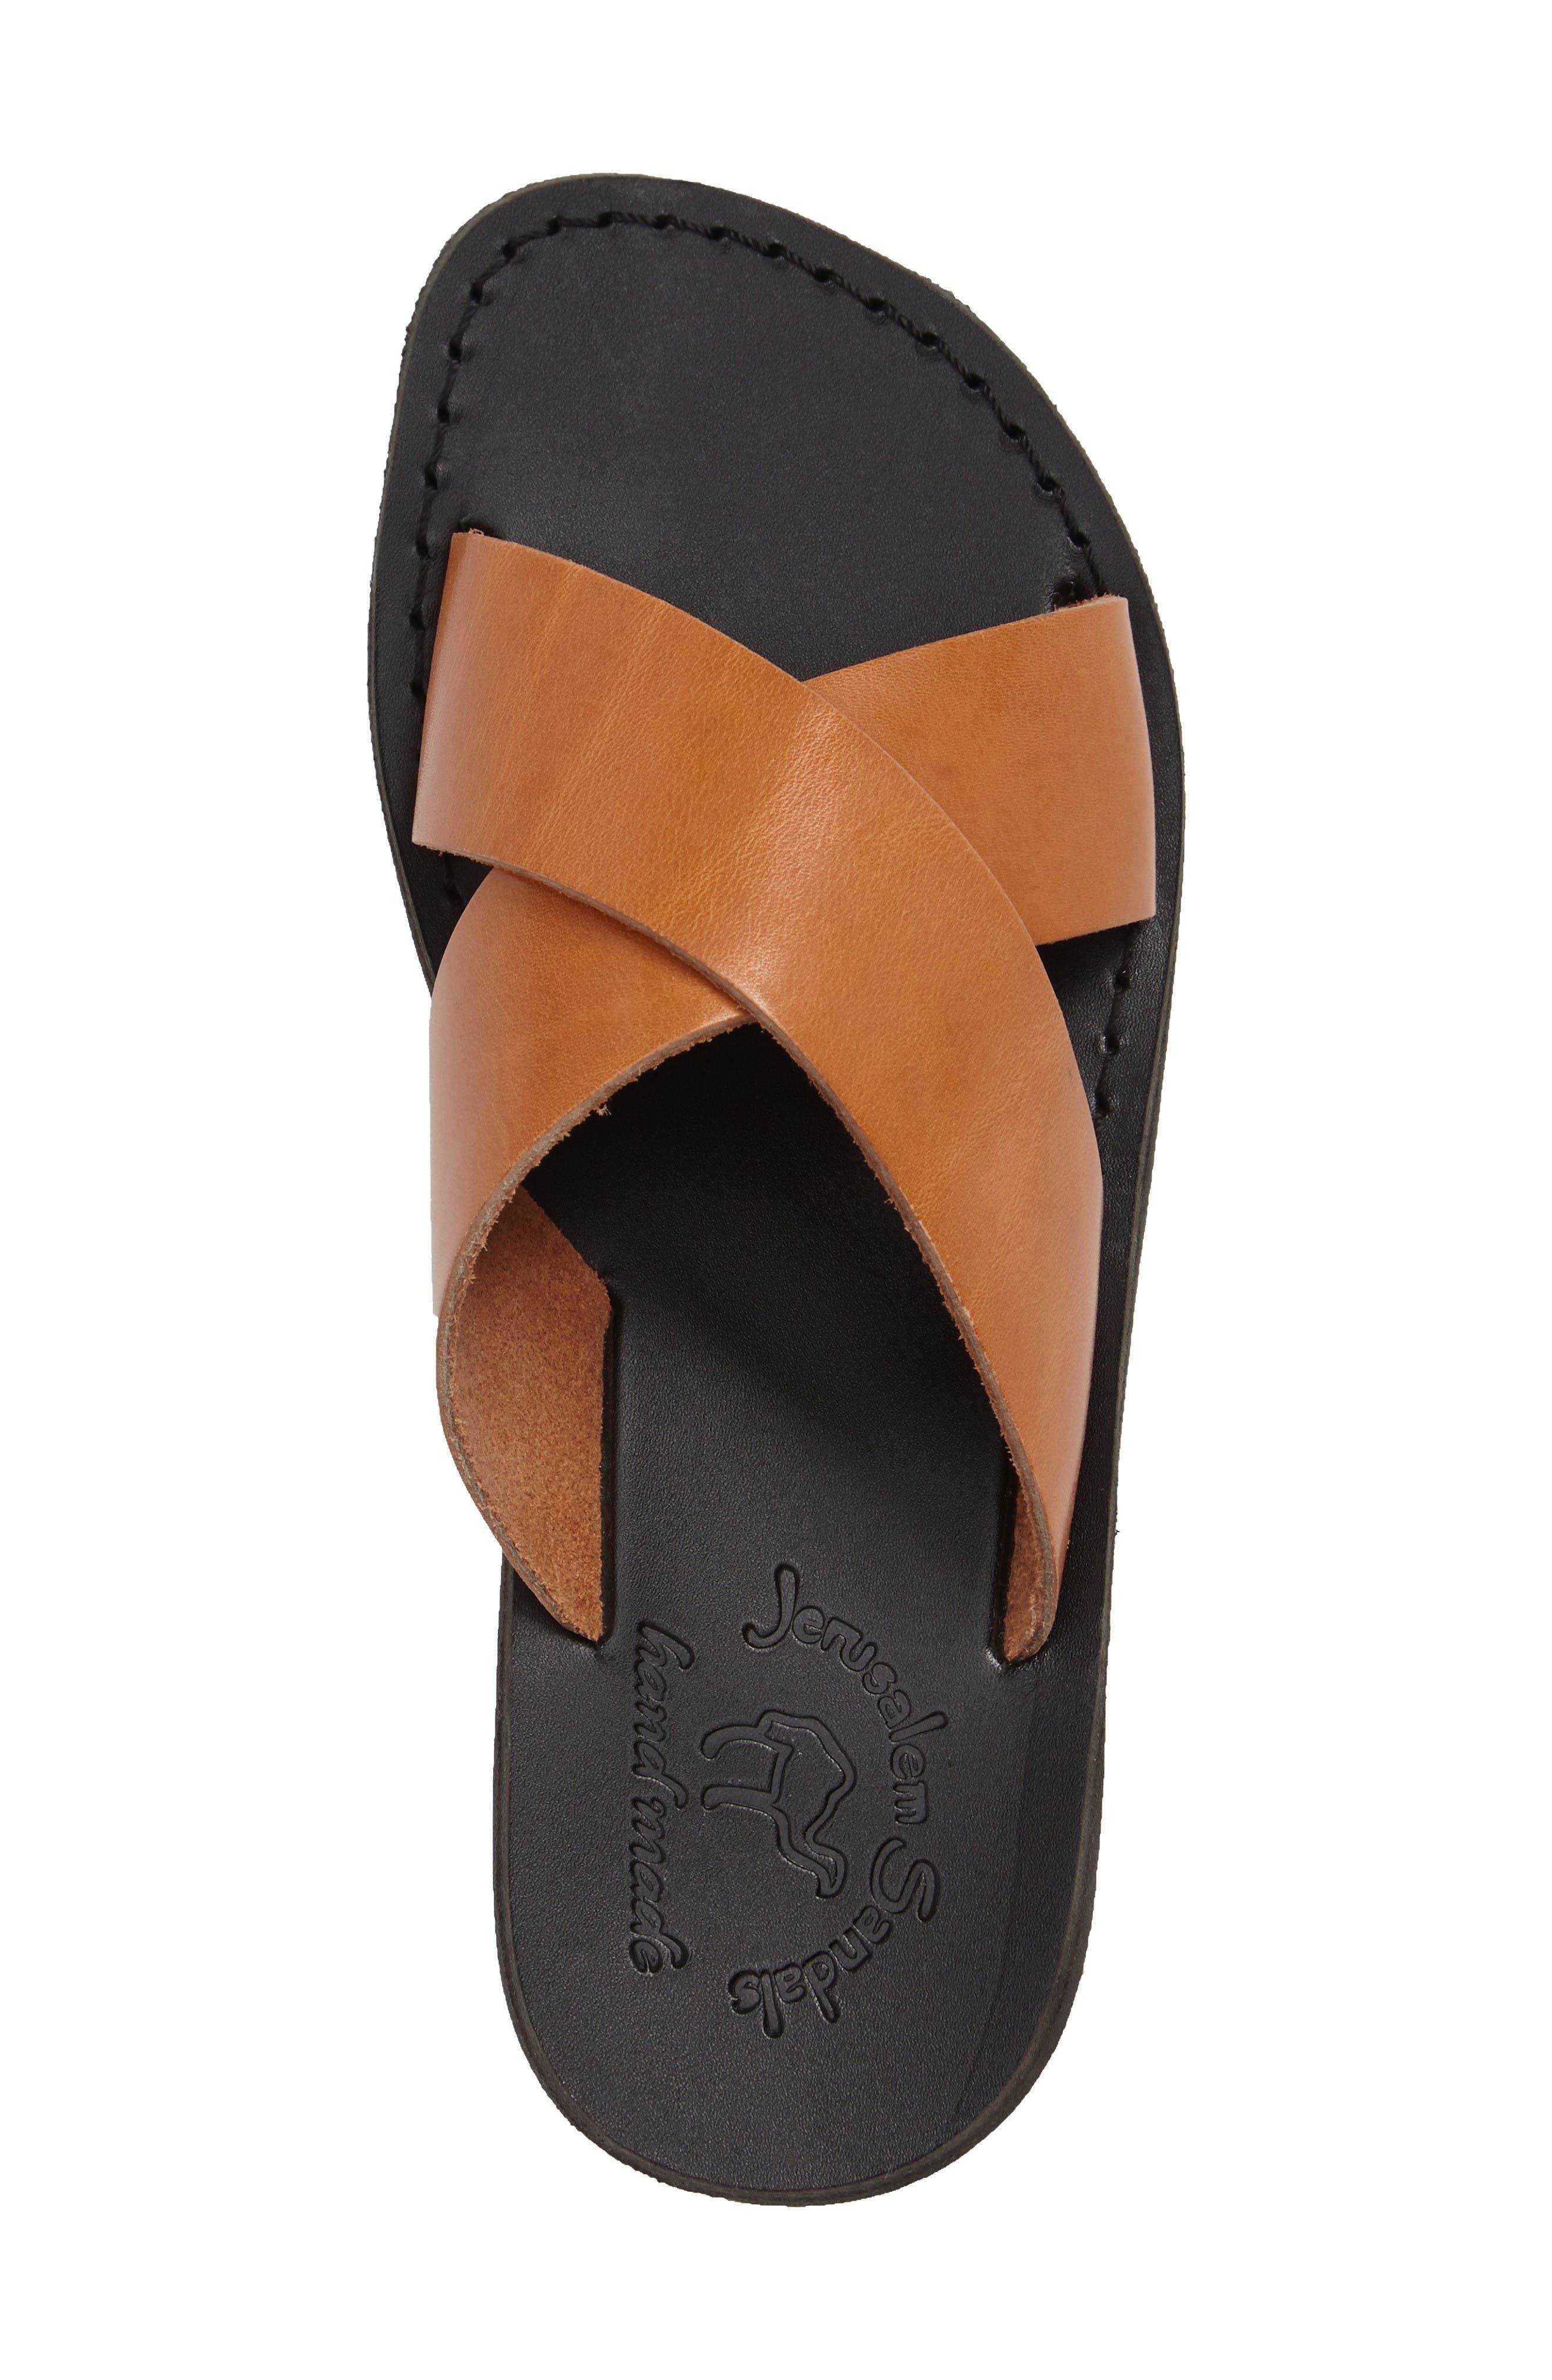 Elan Crisscross Sandal,                             Alternate thumbnail 3, color,                             Brown/ Tan Leather